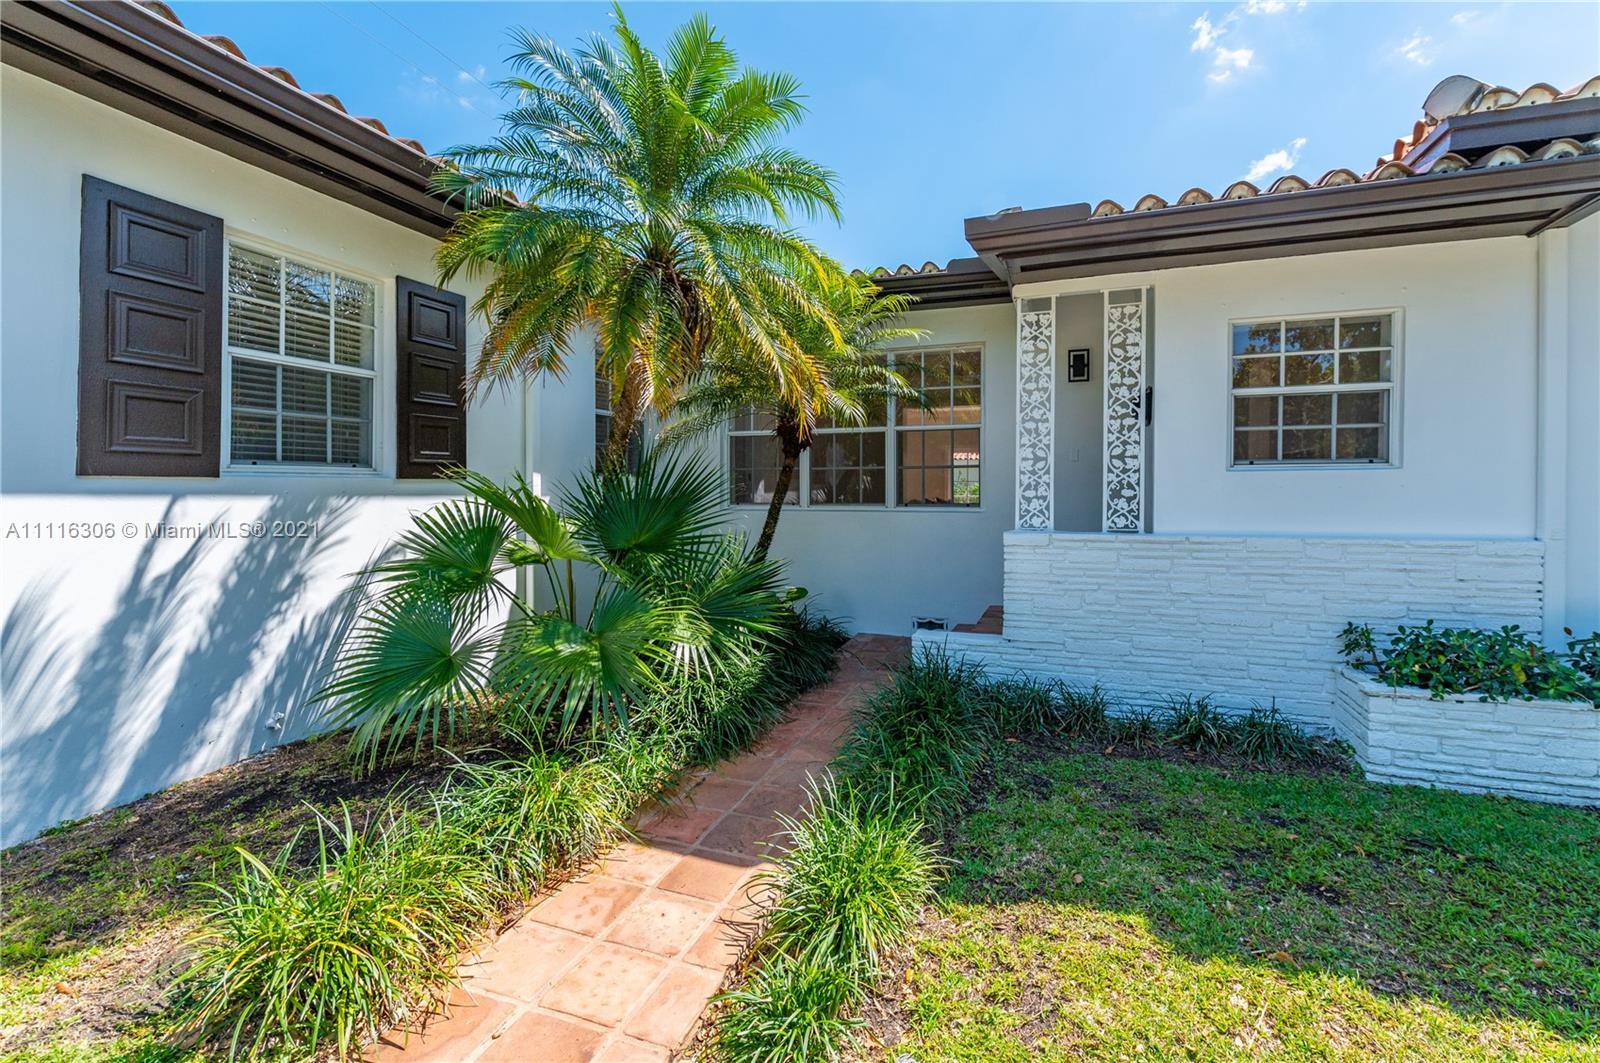 Single Family Home,For Rent,1540 Urbino Ave, Coral Gables, Florida 33146,Brickell,realty,broker,condos near me